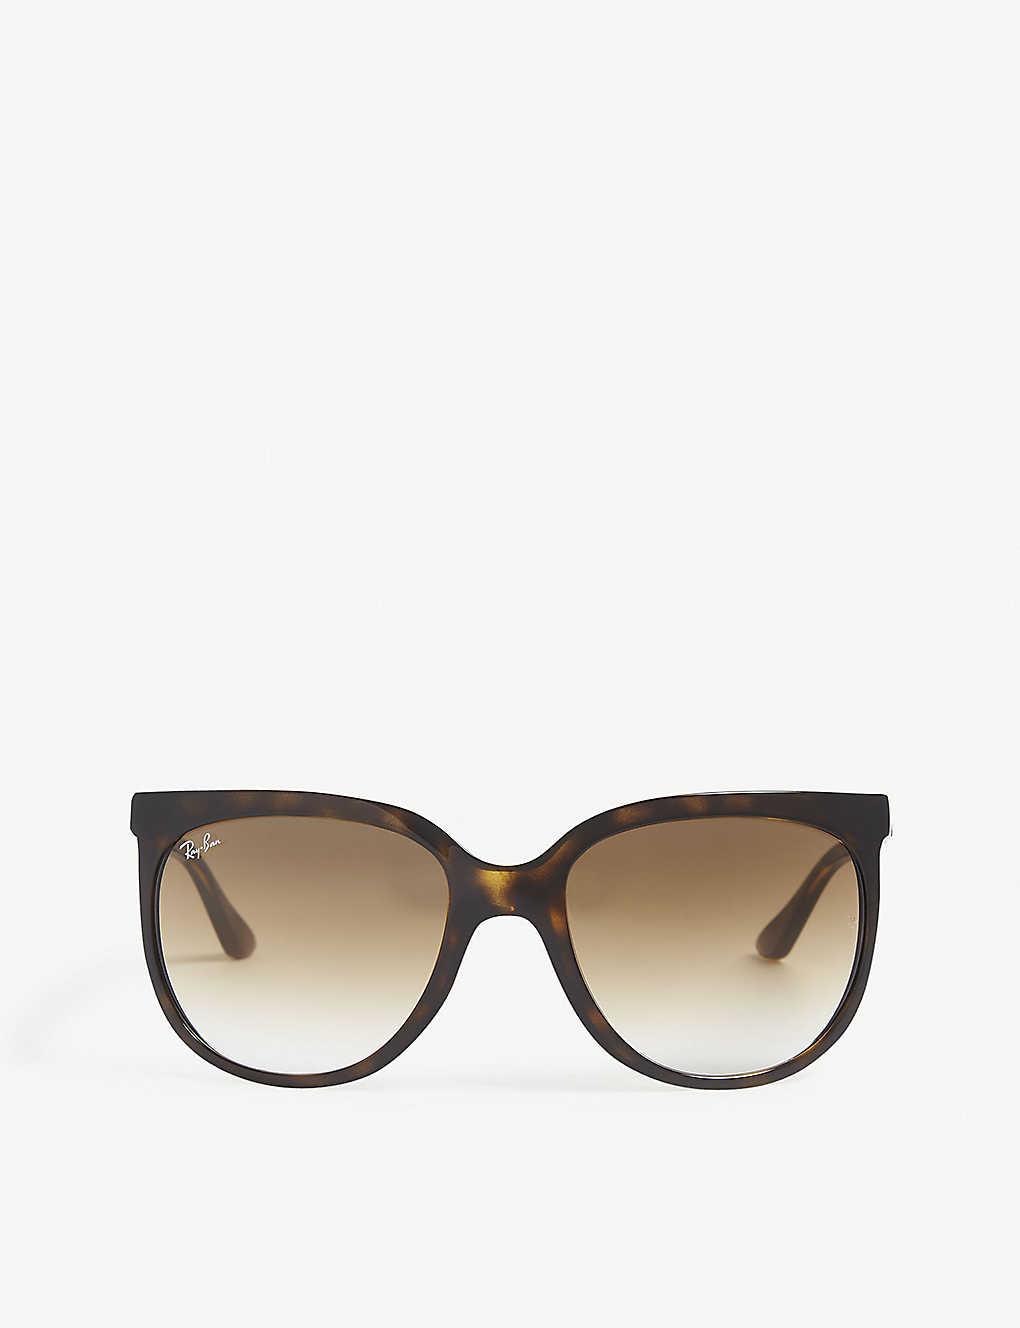 d9f96e1f72f99 RB4126 tortoiseshell square-frame sunglasses - Havana ...